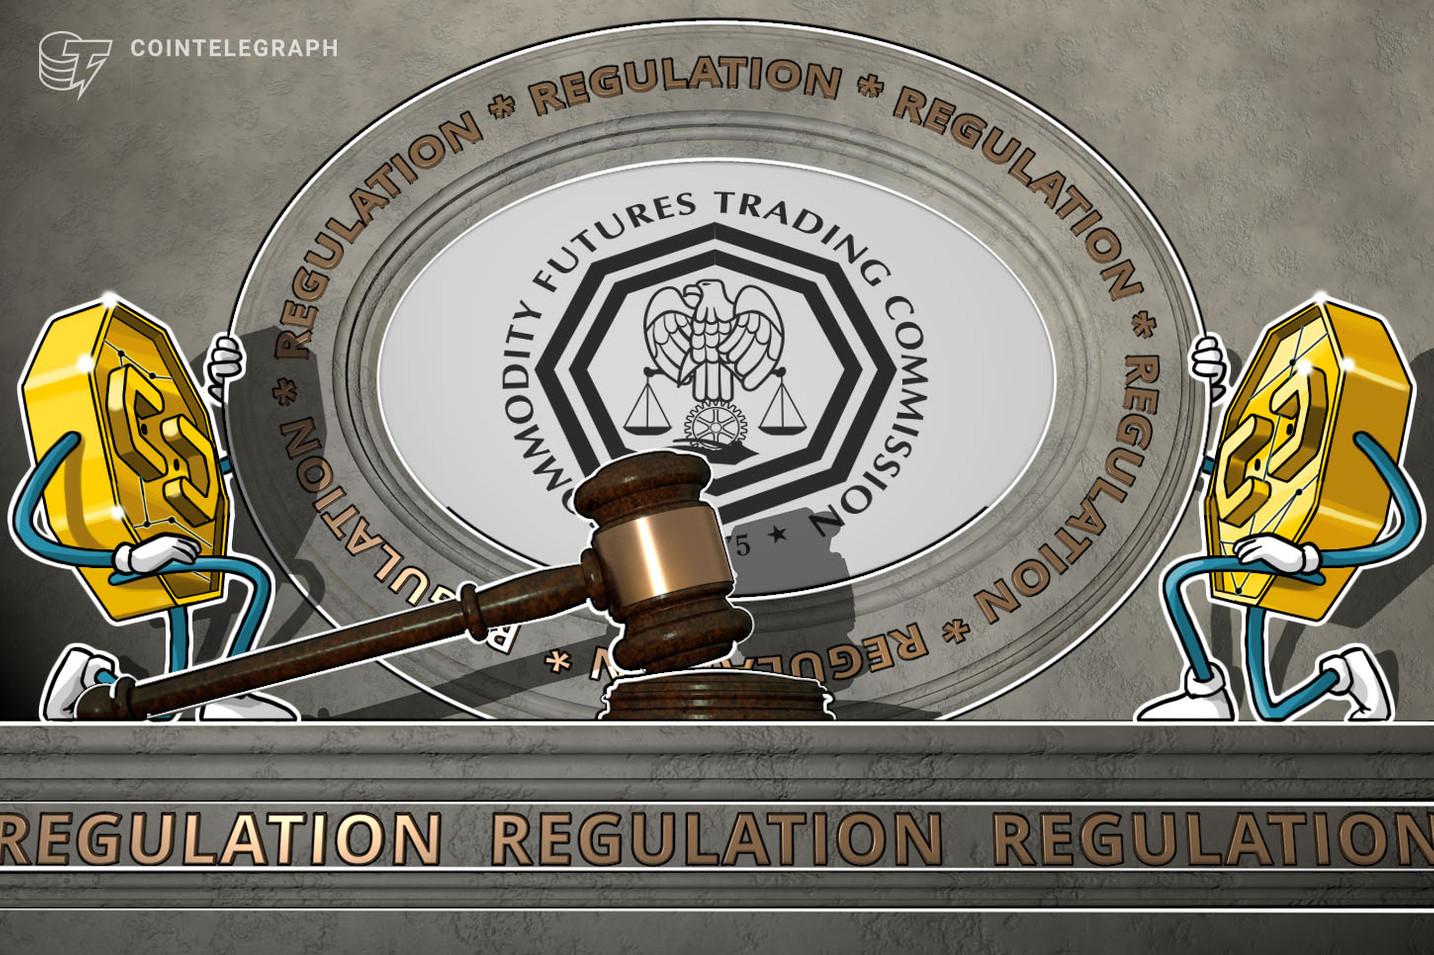 CFTC verhängt Bußgeld gegen Handelsplattform - Illegale Bitcoin-Transaktionen